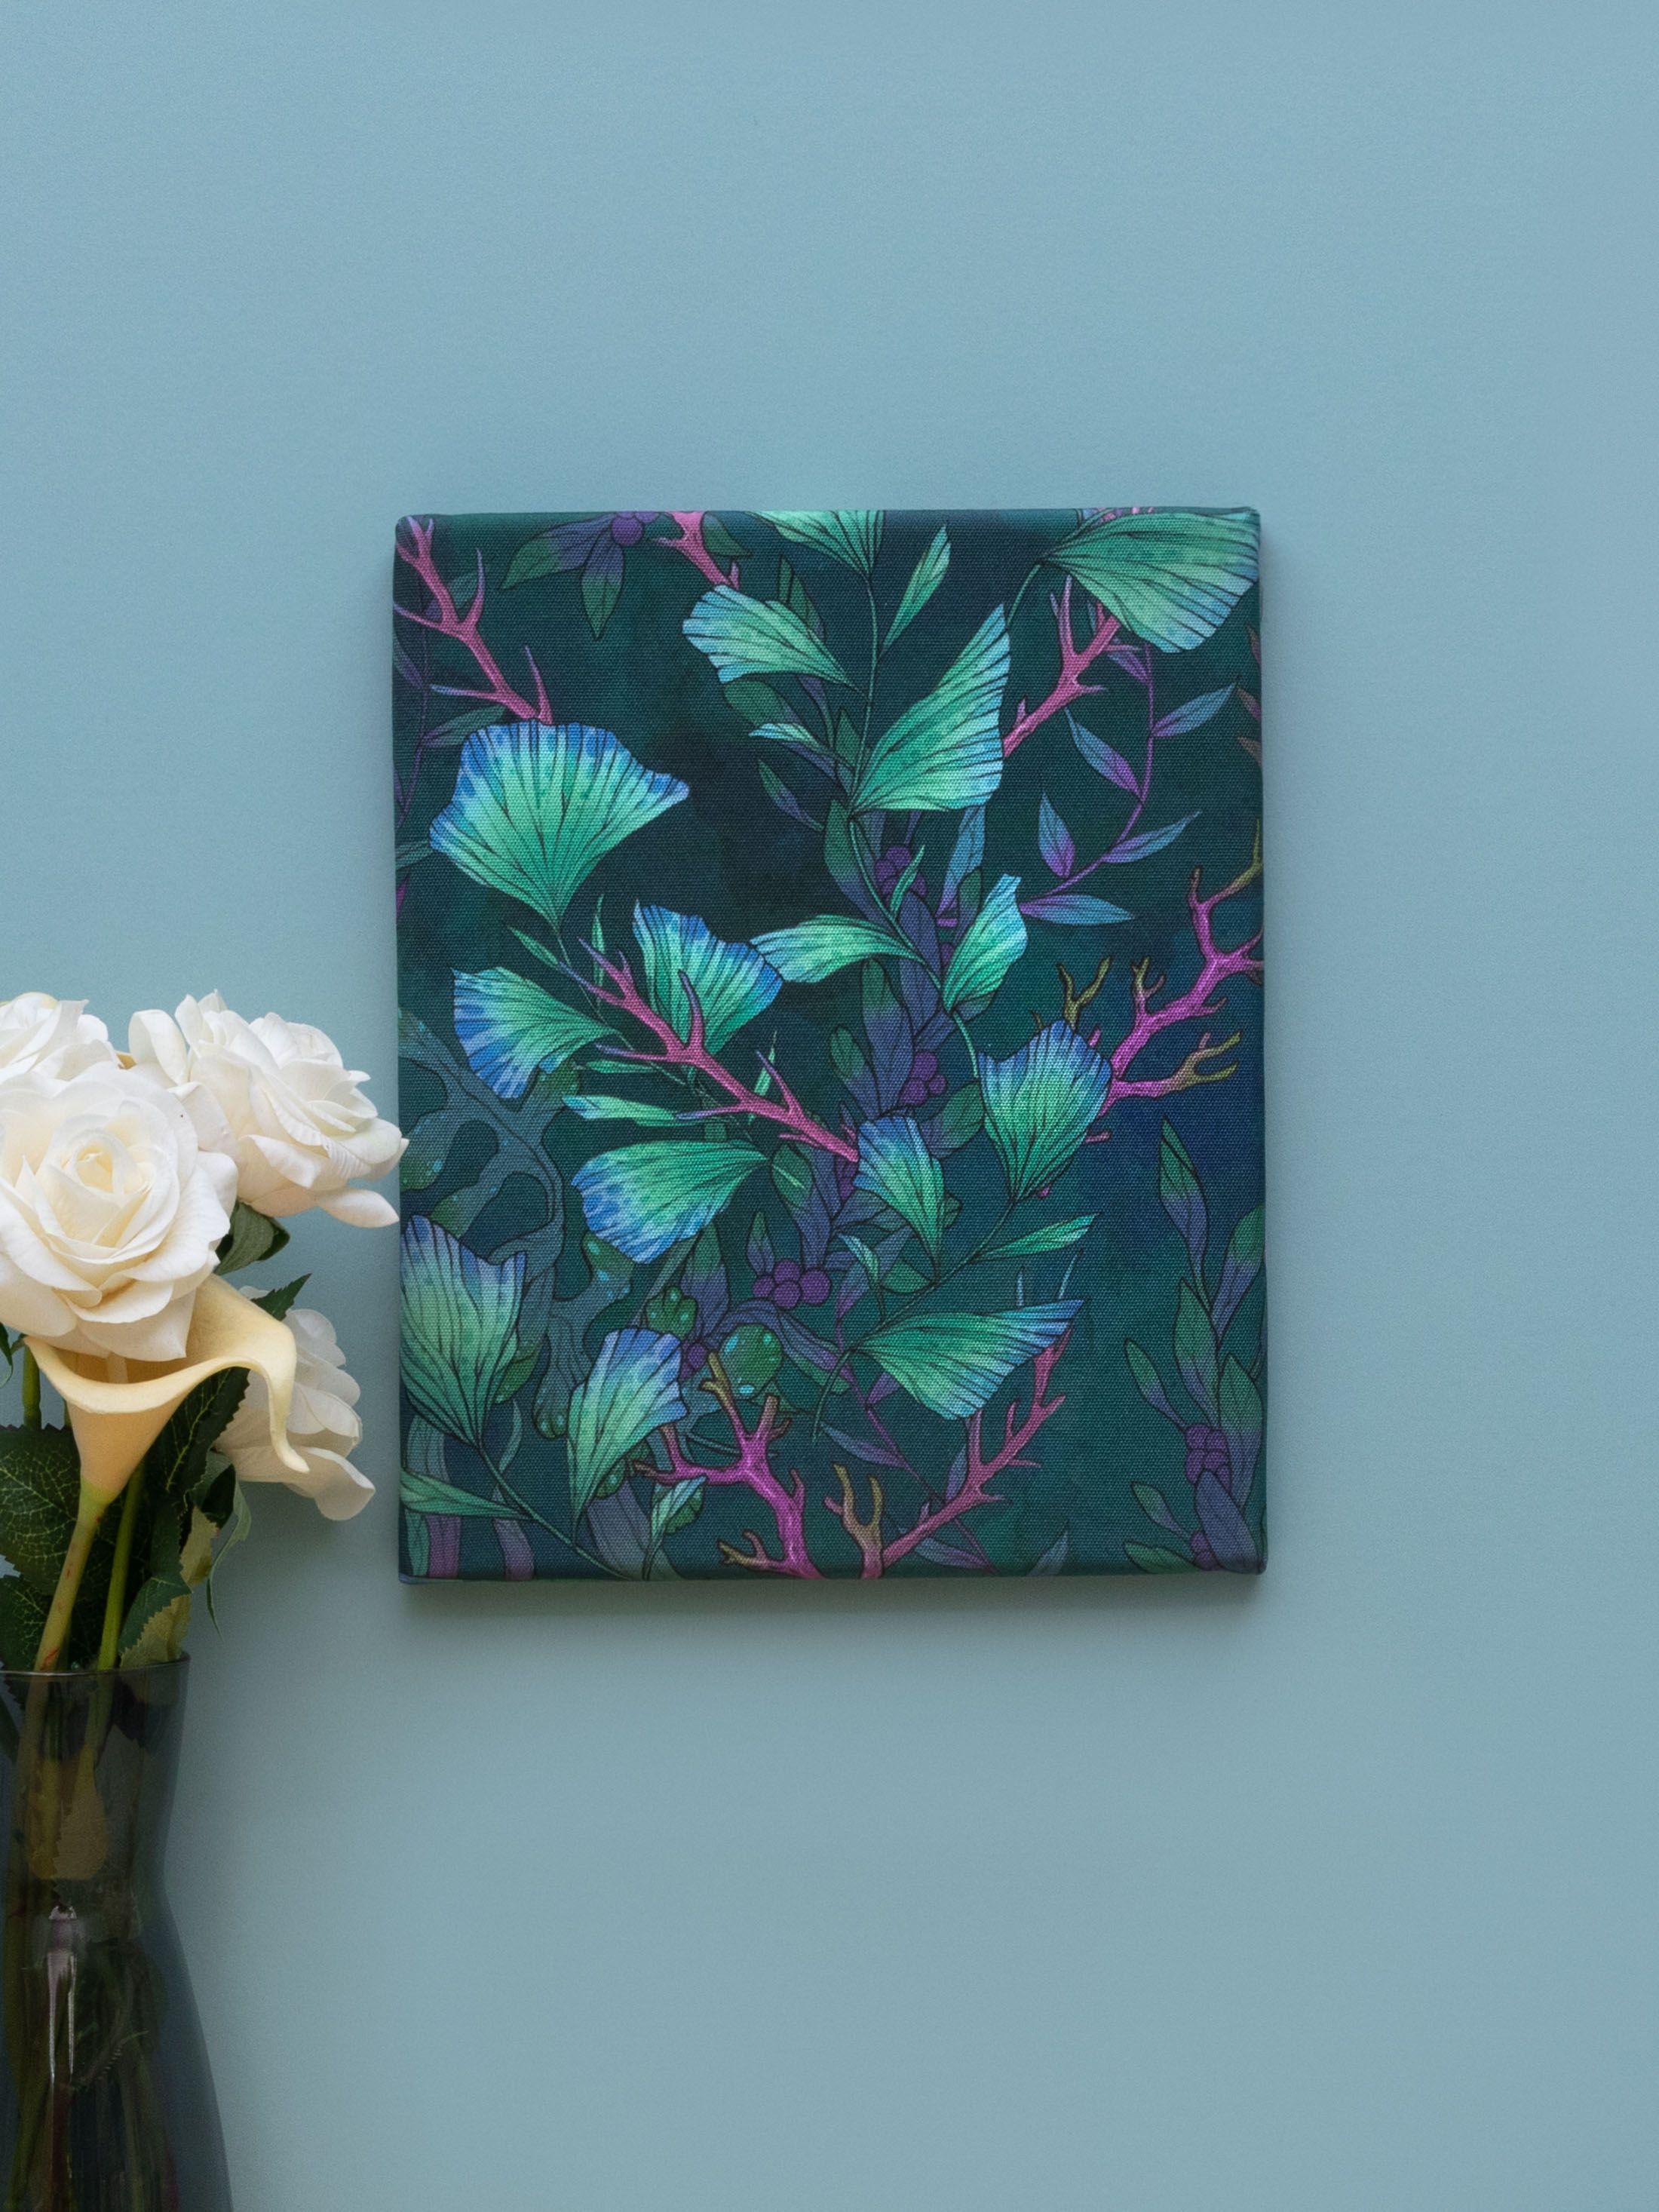 gepersonaliseerd mini canvas